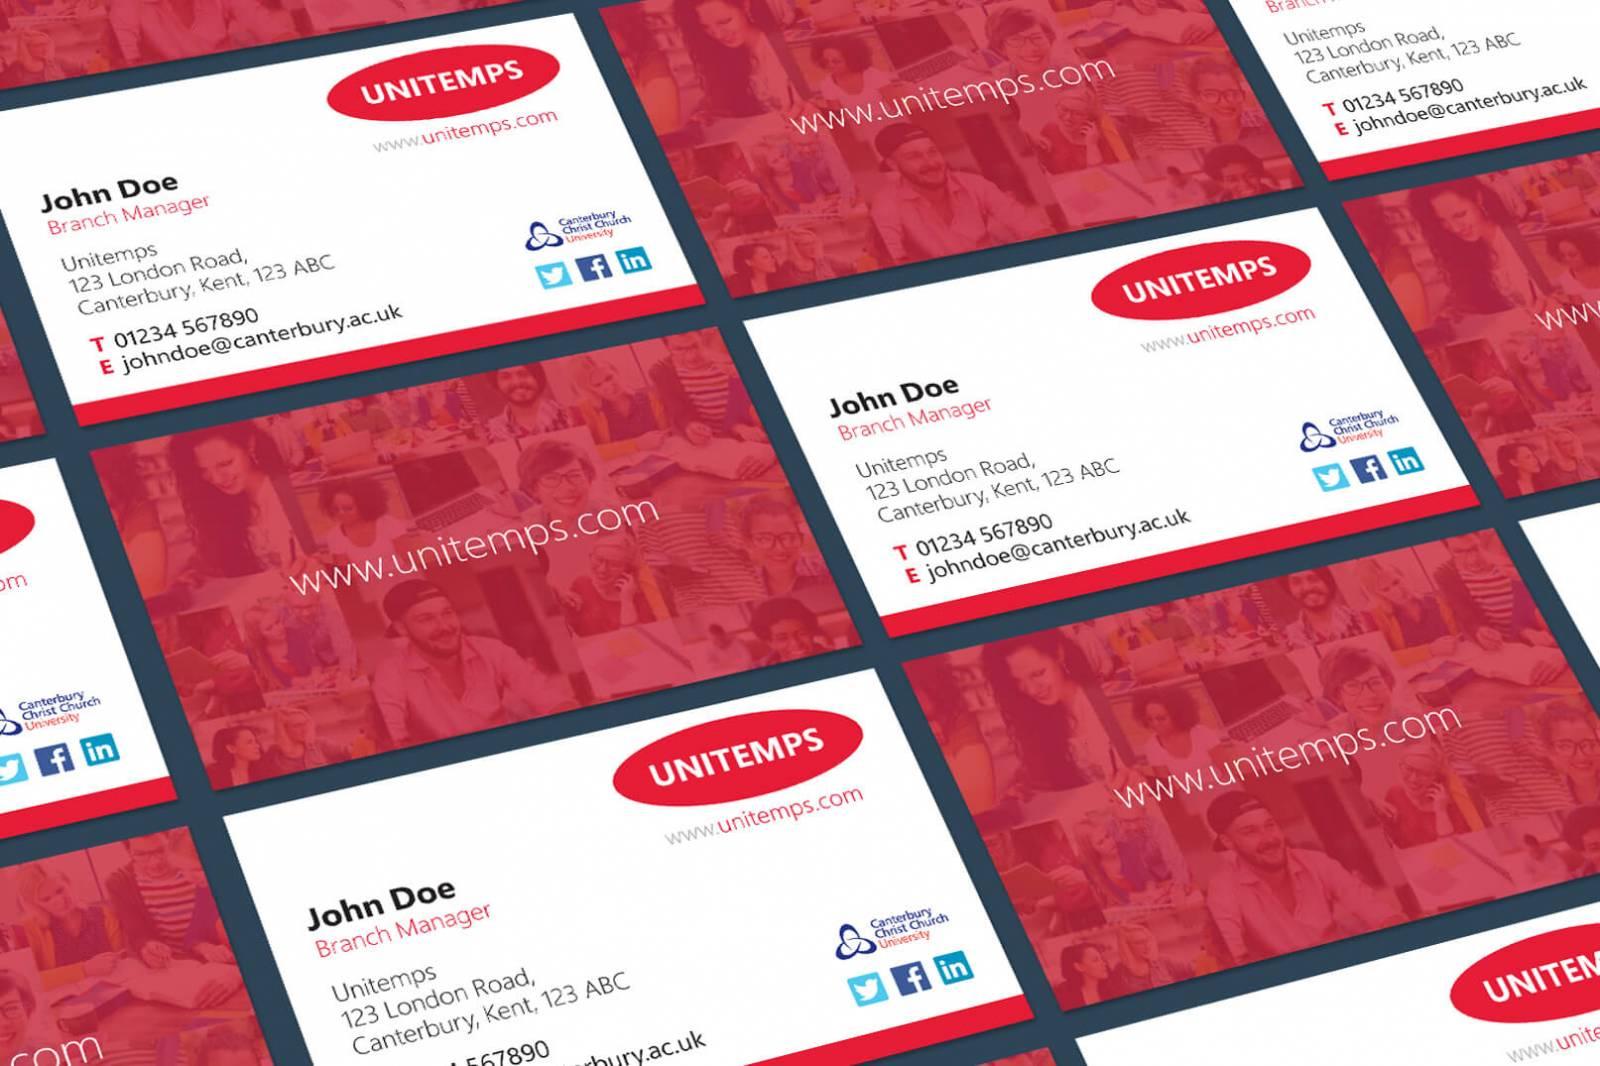 Unitemps-business-card-design-agency-graphic-design-canterbury.jpg